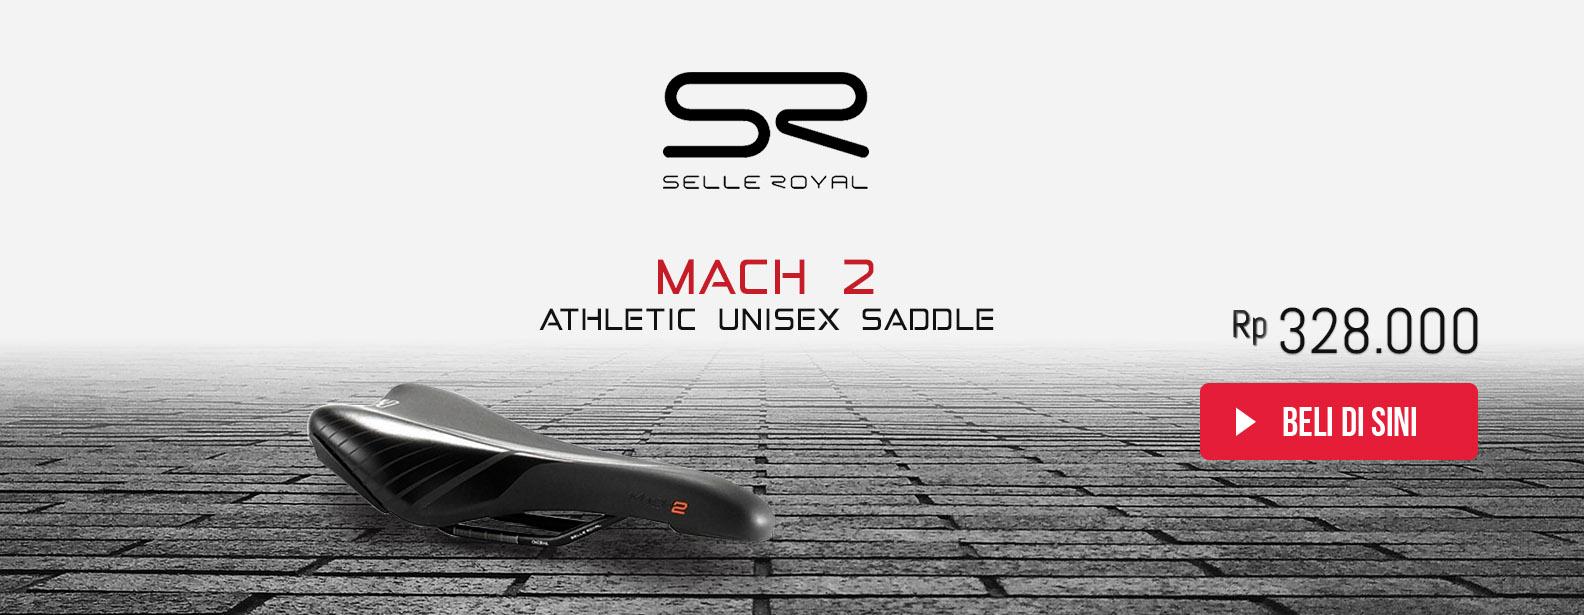 Selle Royal Sadel Sepeda Mach 2 Athletic Unisex